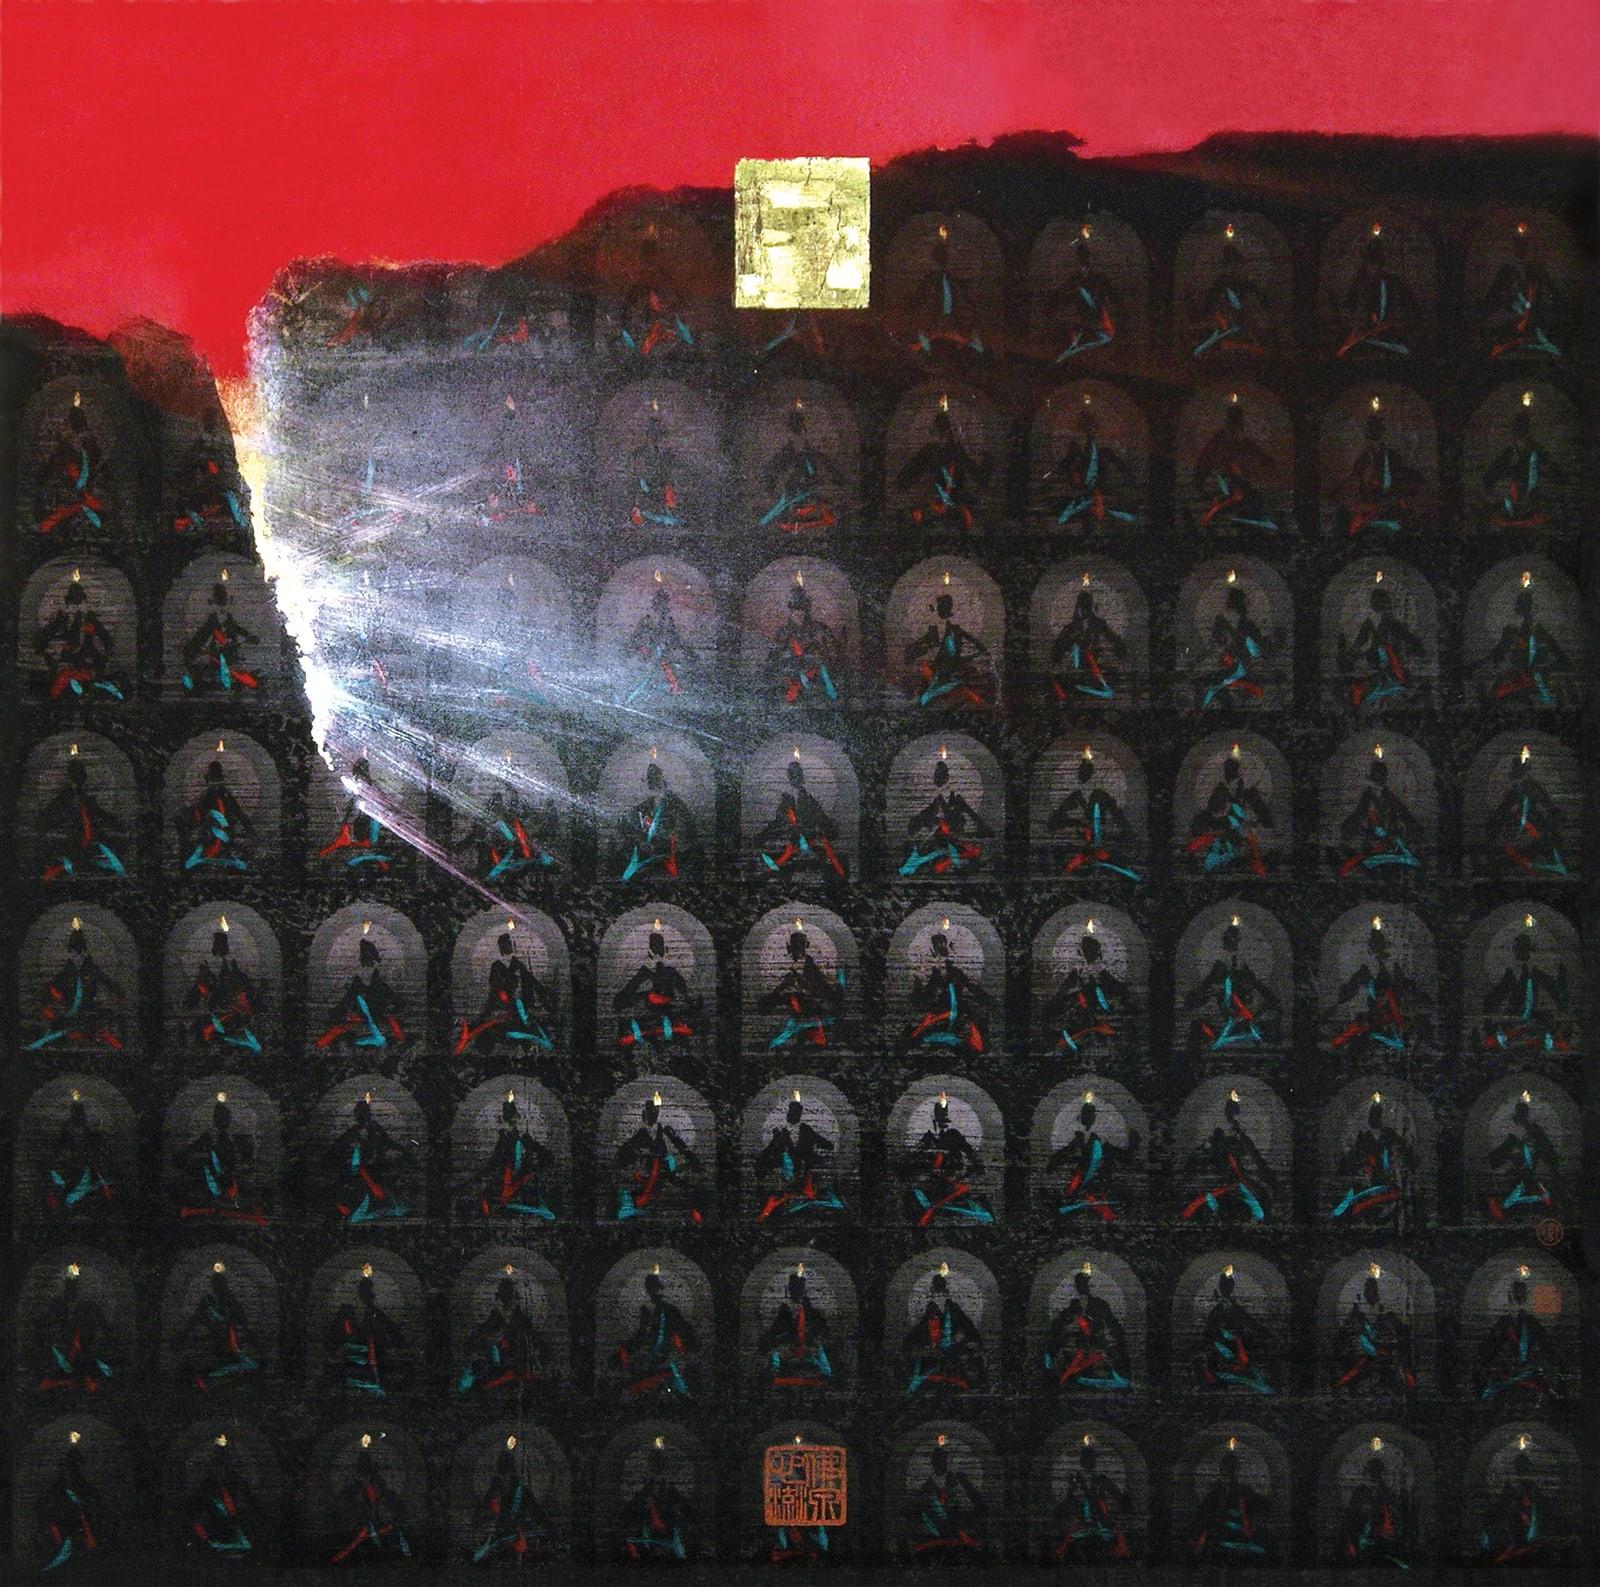 Kwok Hon Sum 郭漢深, Enlightenment 覺悟, 1998